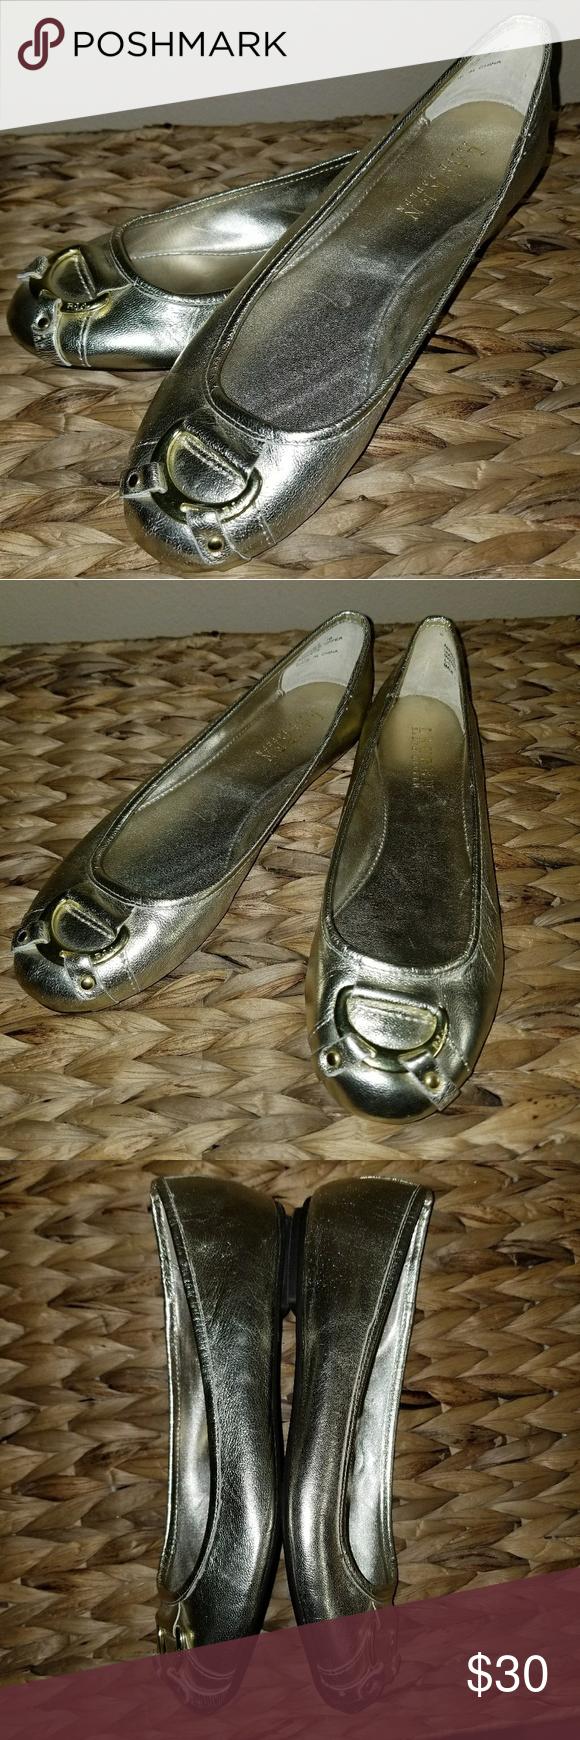 b944fb61aa Lauren Ralph Lauren Abigaile Gold Flats sz 7 Lauren by Ralph Lauren Size   7B Color  gold Style  Abigaile 100% leather Like new condition!